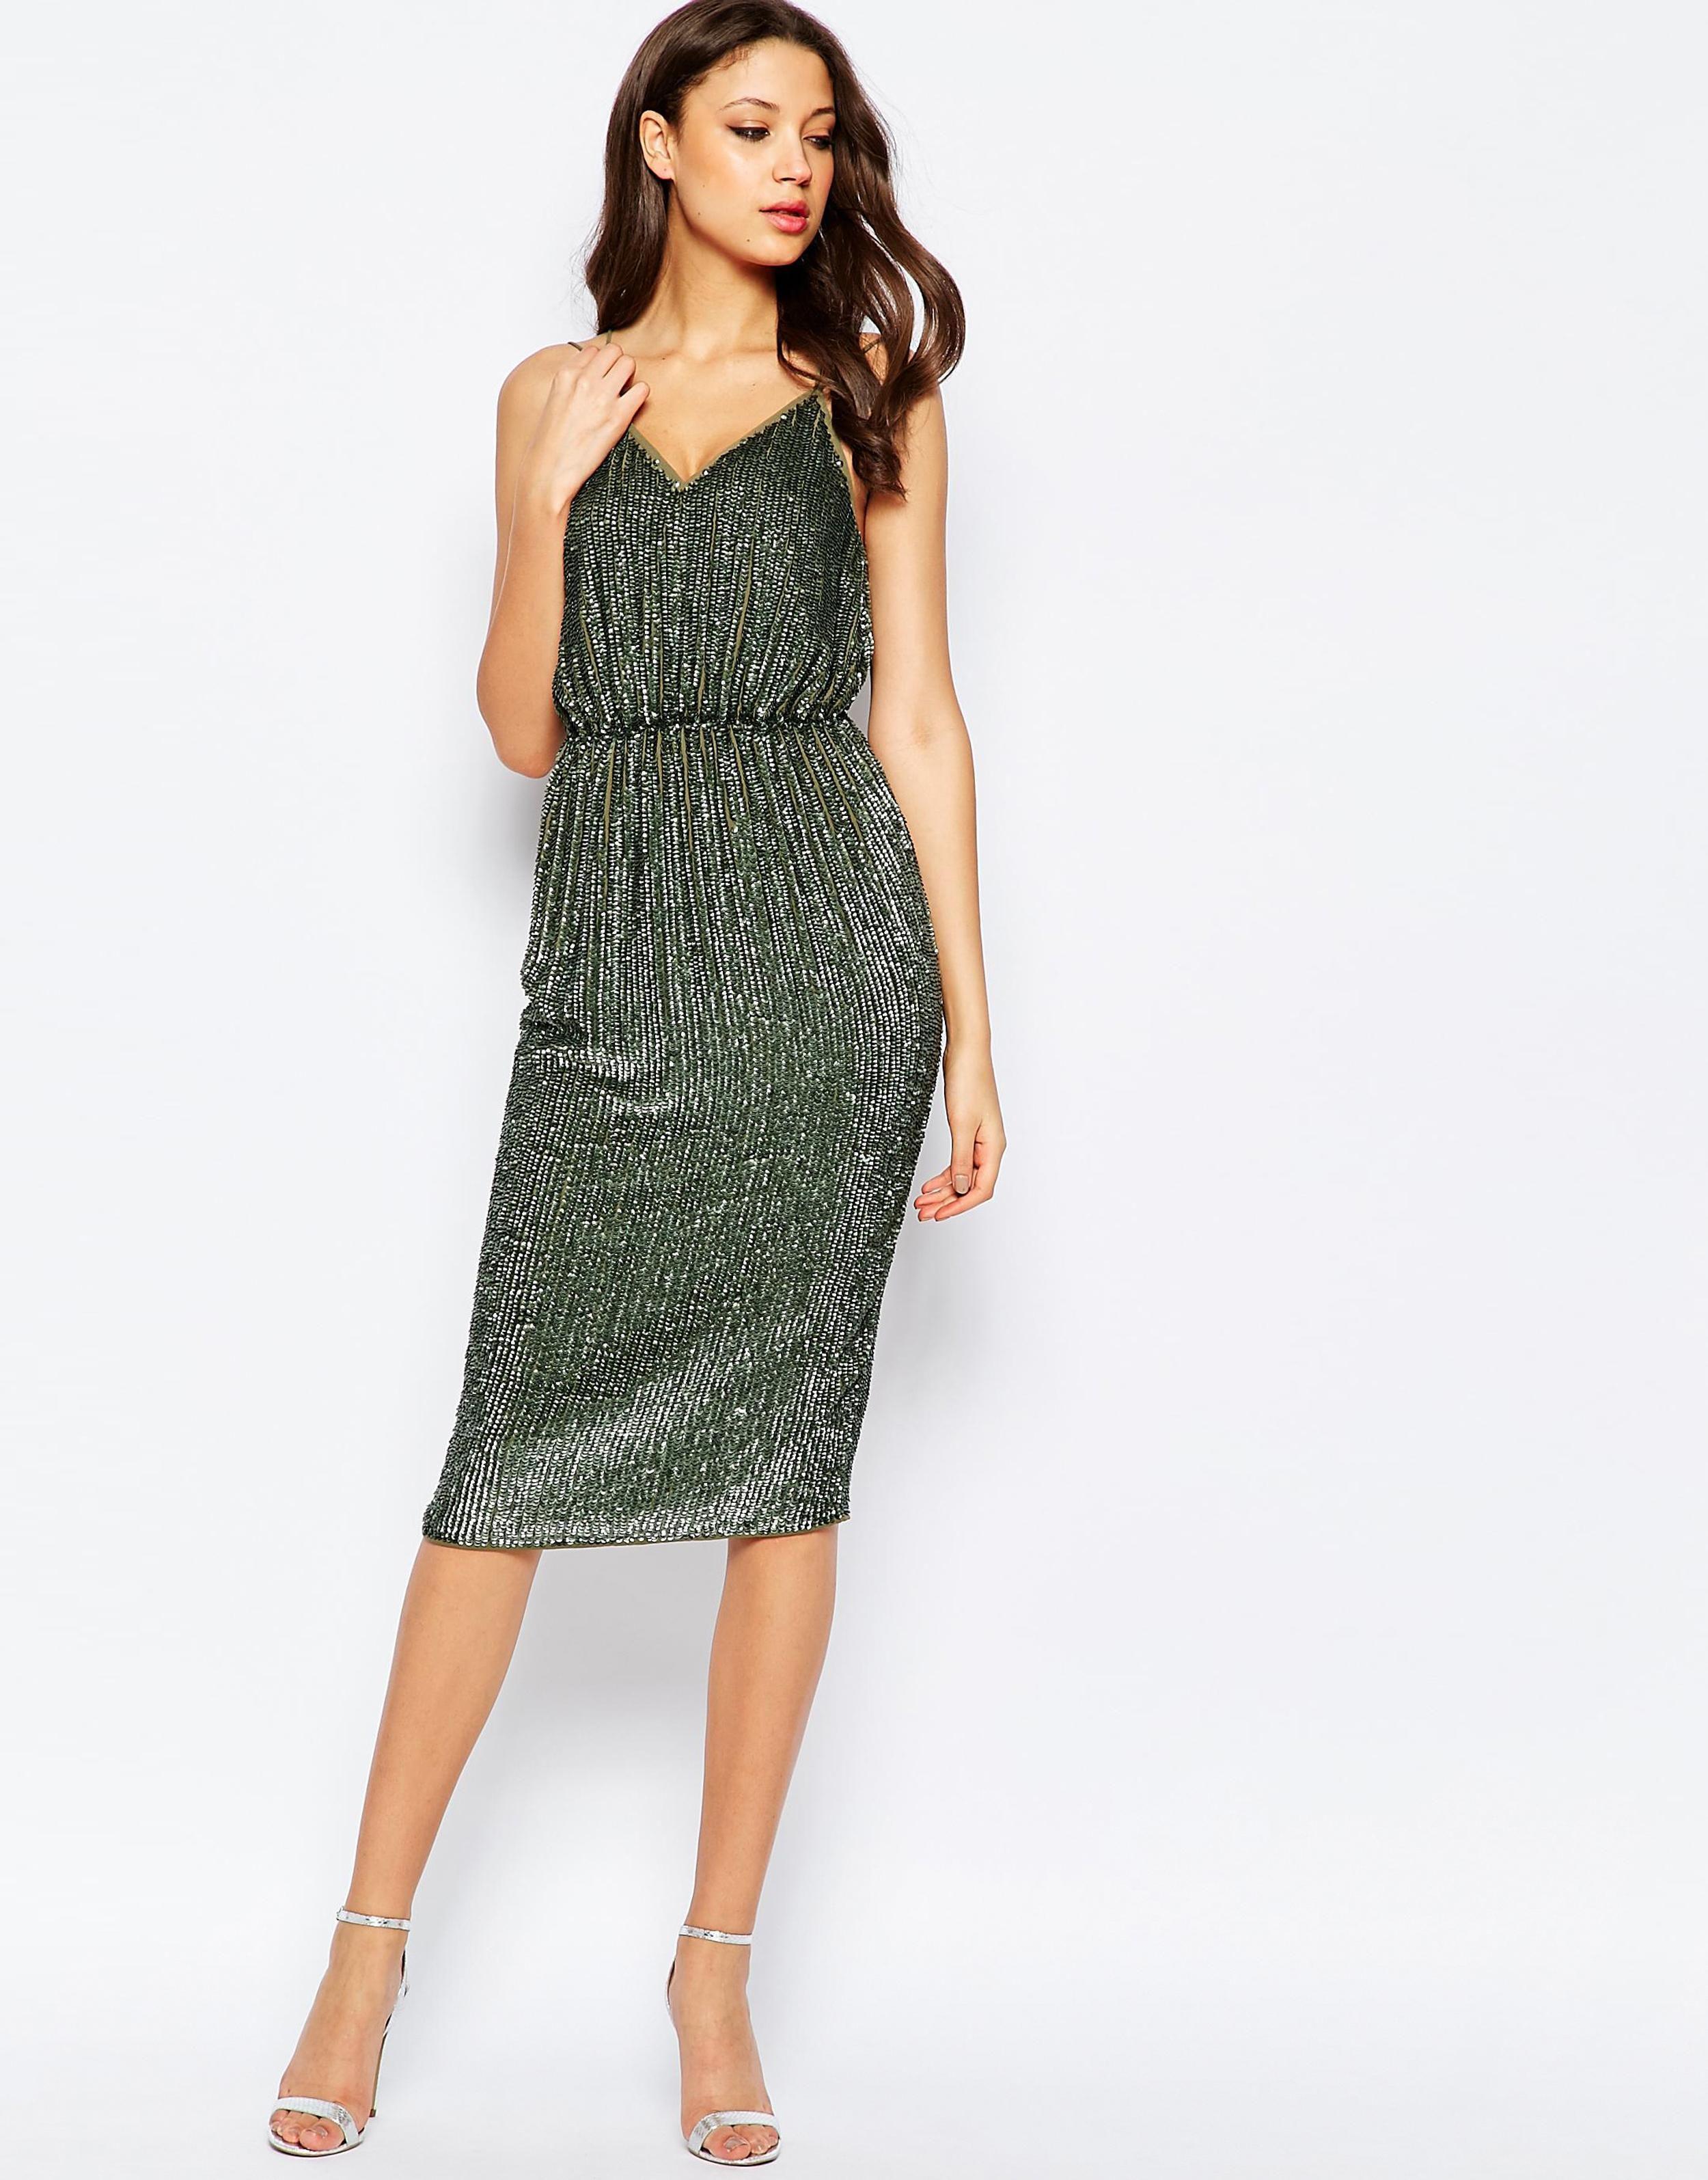 Www Asos Com Asos Tall Embellished Midi Dress With Drape Back Candice Blackburn Product Page Embellished Midi Dress Dresses Maxi Dress Party [ 3190 x 2500 Pixel ]